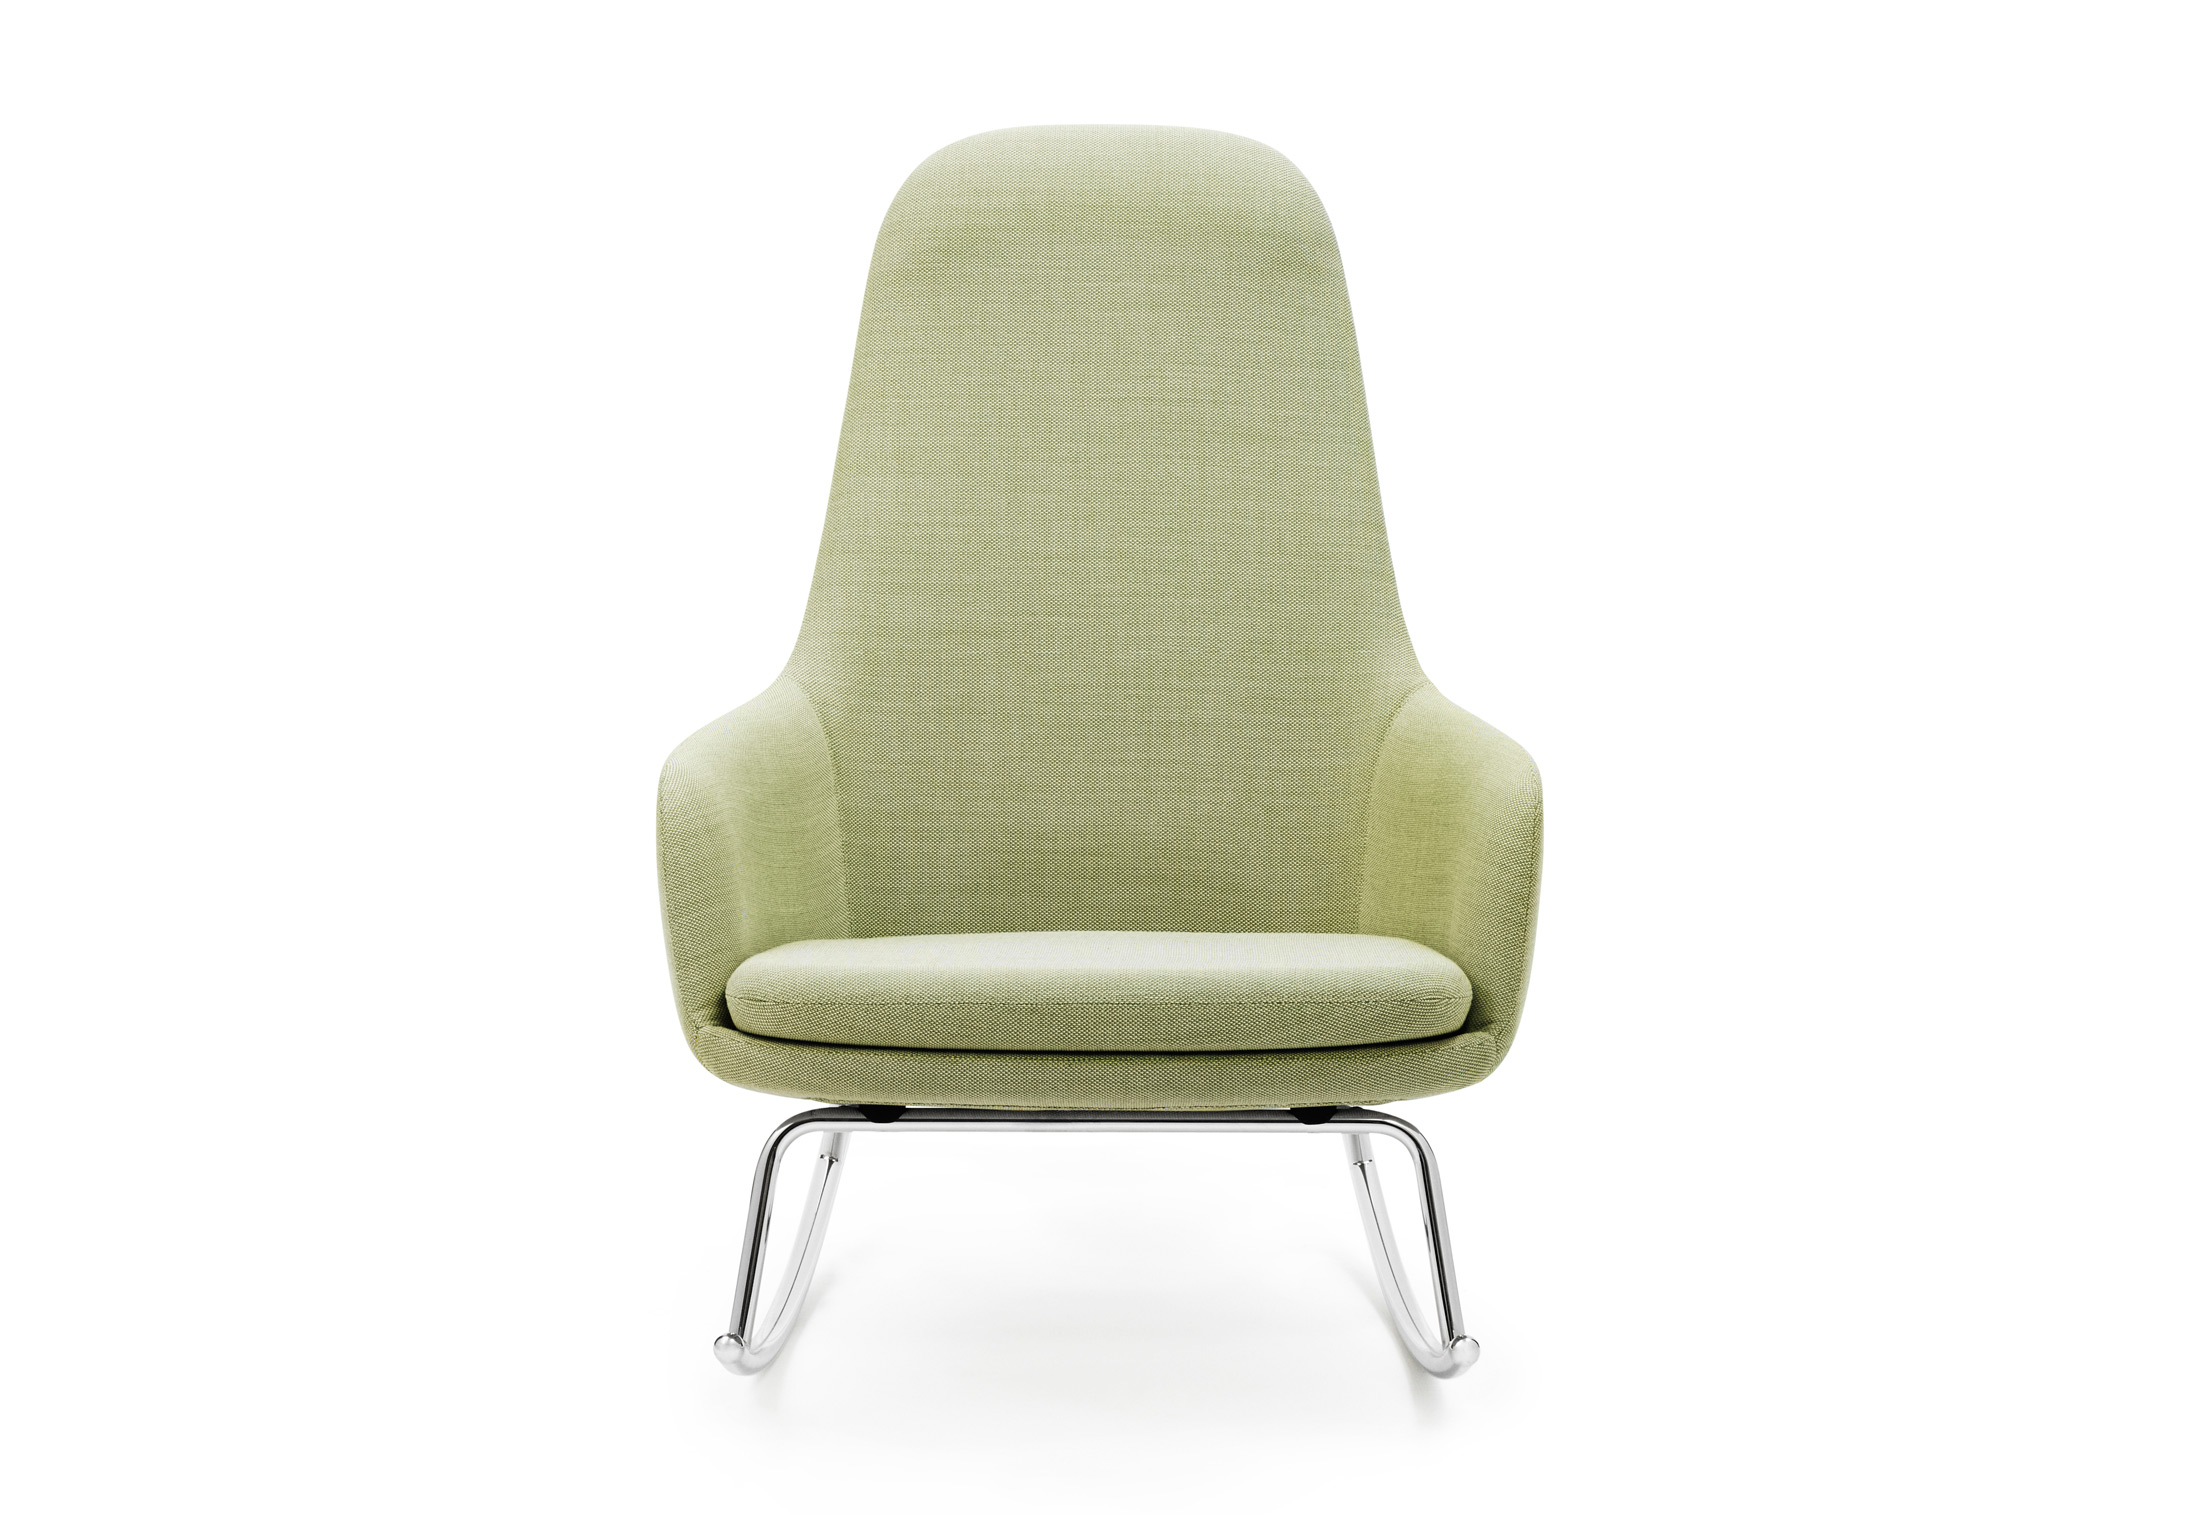 Tremendous Era Rocking Chair High By Normann Copenhagen Stylepark Creativecarmelina Interior Chair Design Creativecarmelinacom